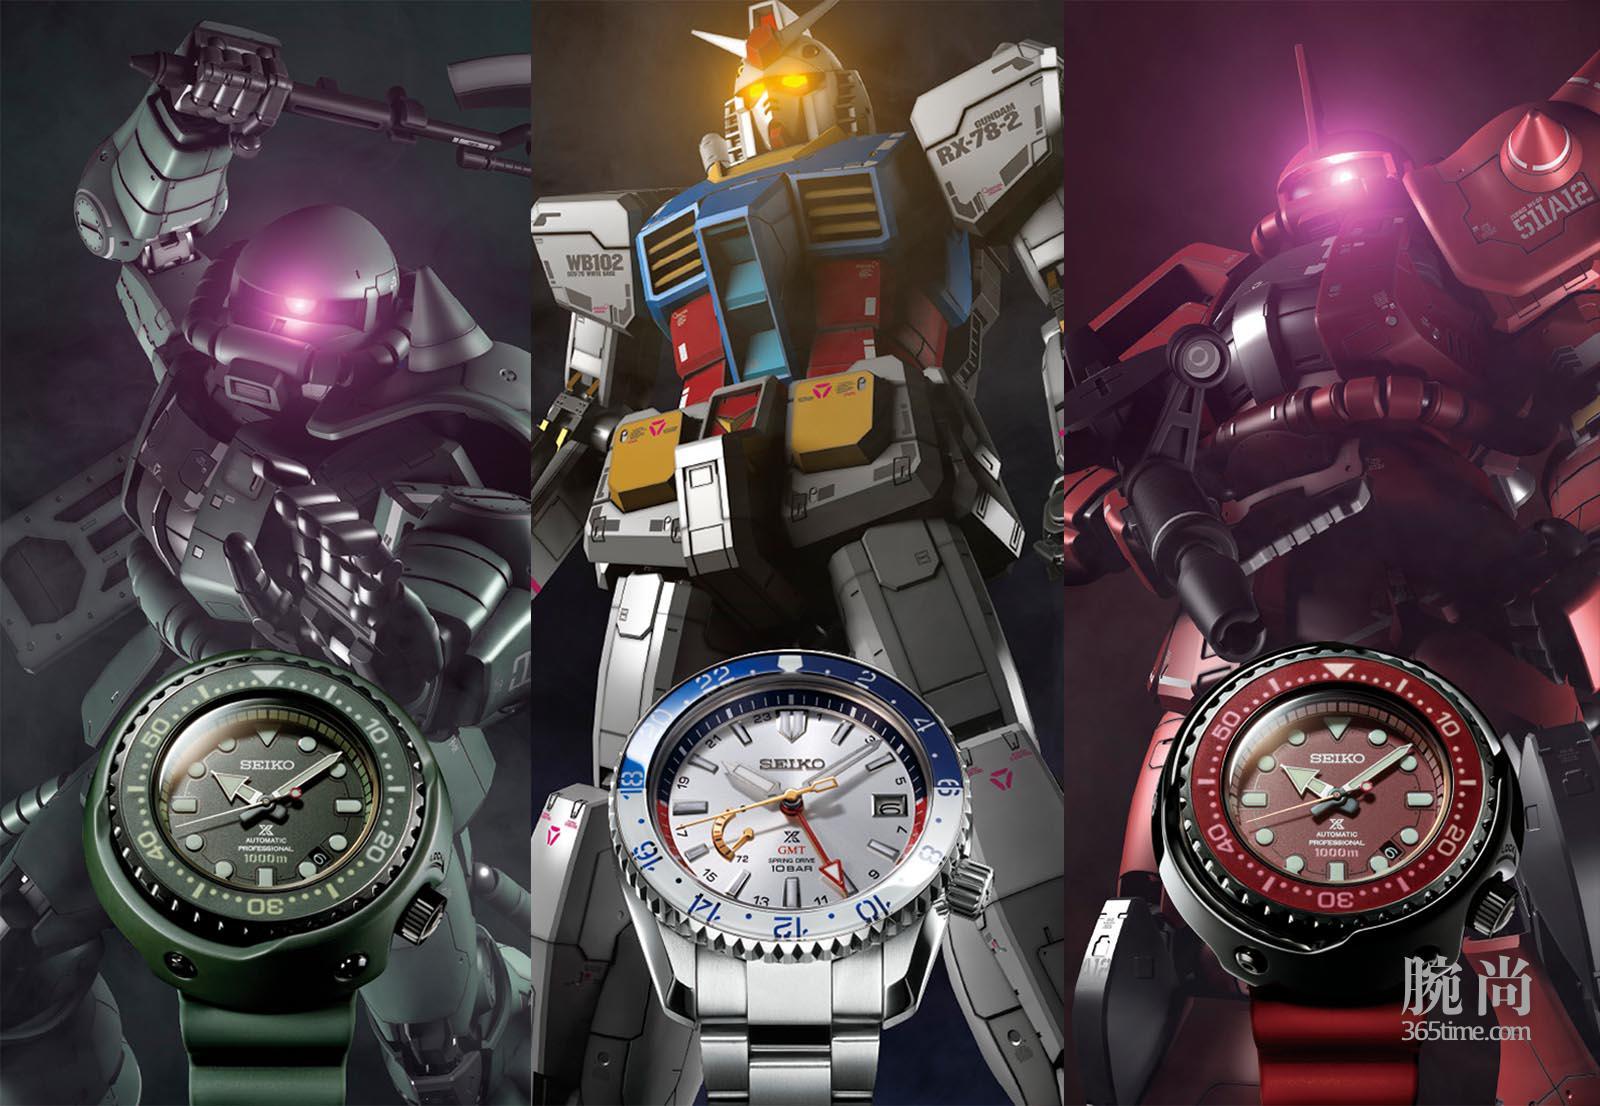 Seiko-Mobile-Suit-Gundam-40th-Anniversary-Limited-Editions.jpg